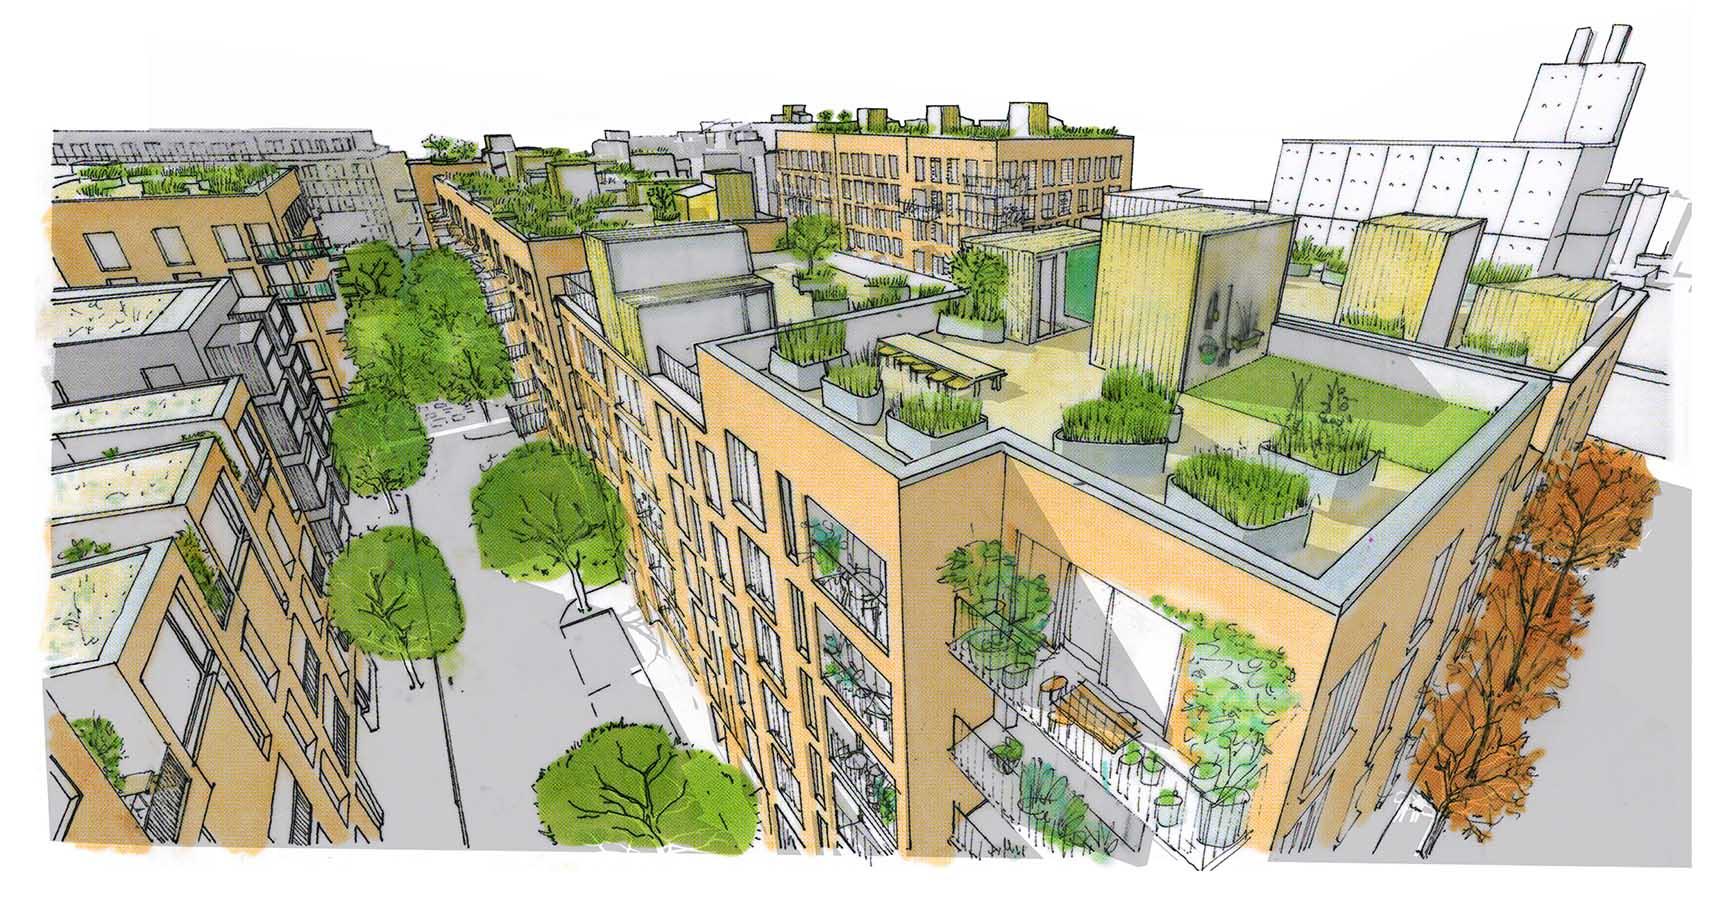 Wickside Hackney London Housing development Ash Sakula sketch view of the rooftop gardens